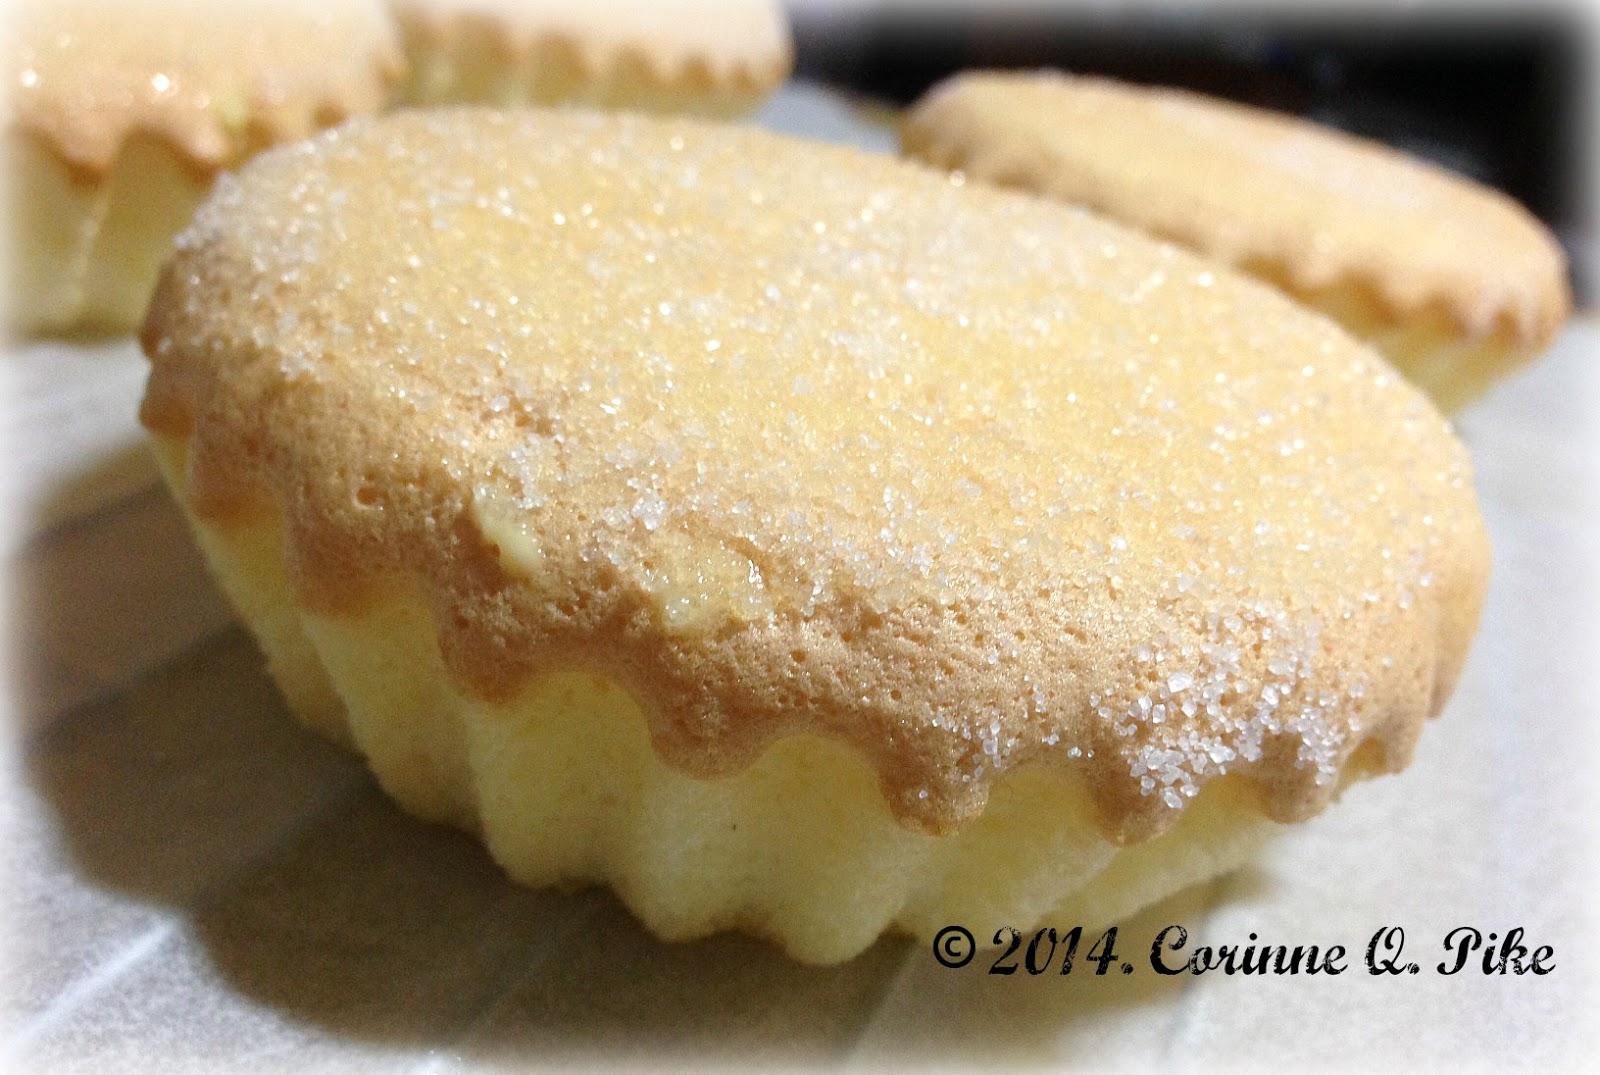 Japanese Fluffy Hot Cake Recipe